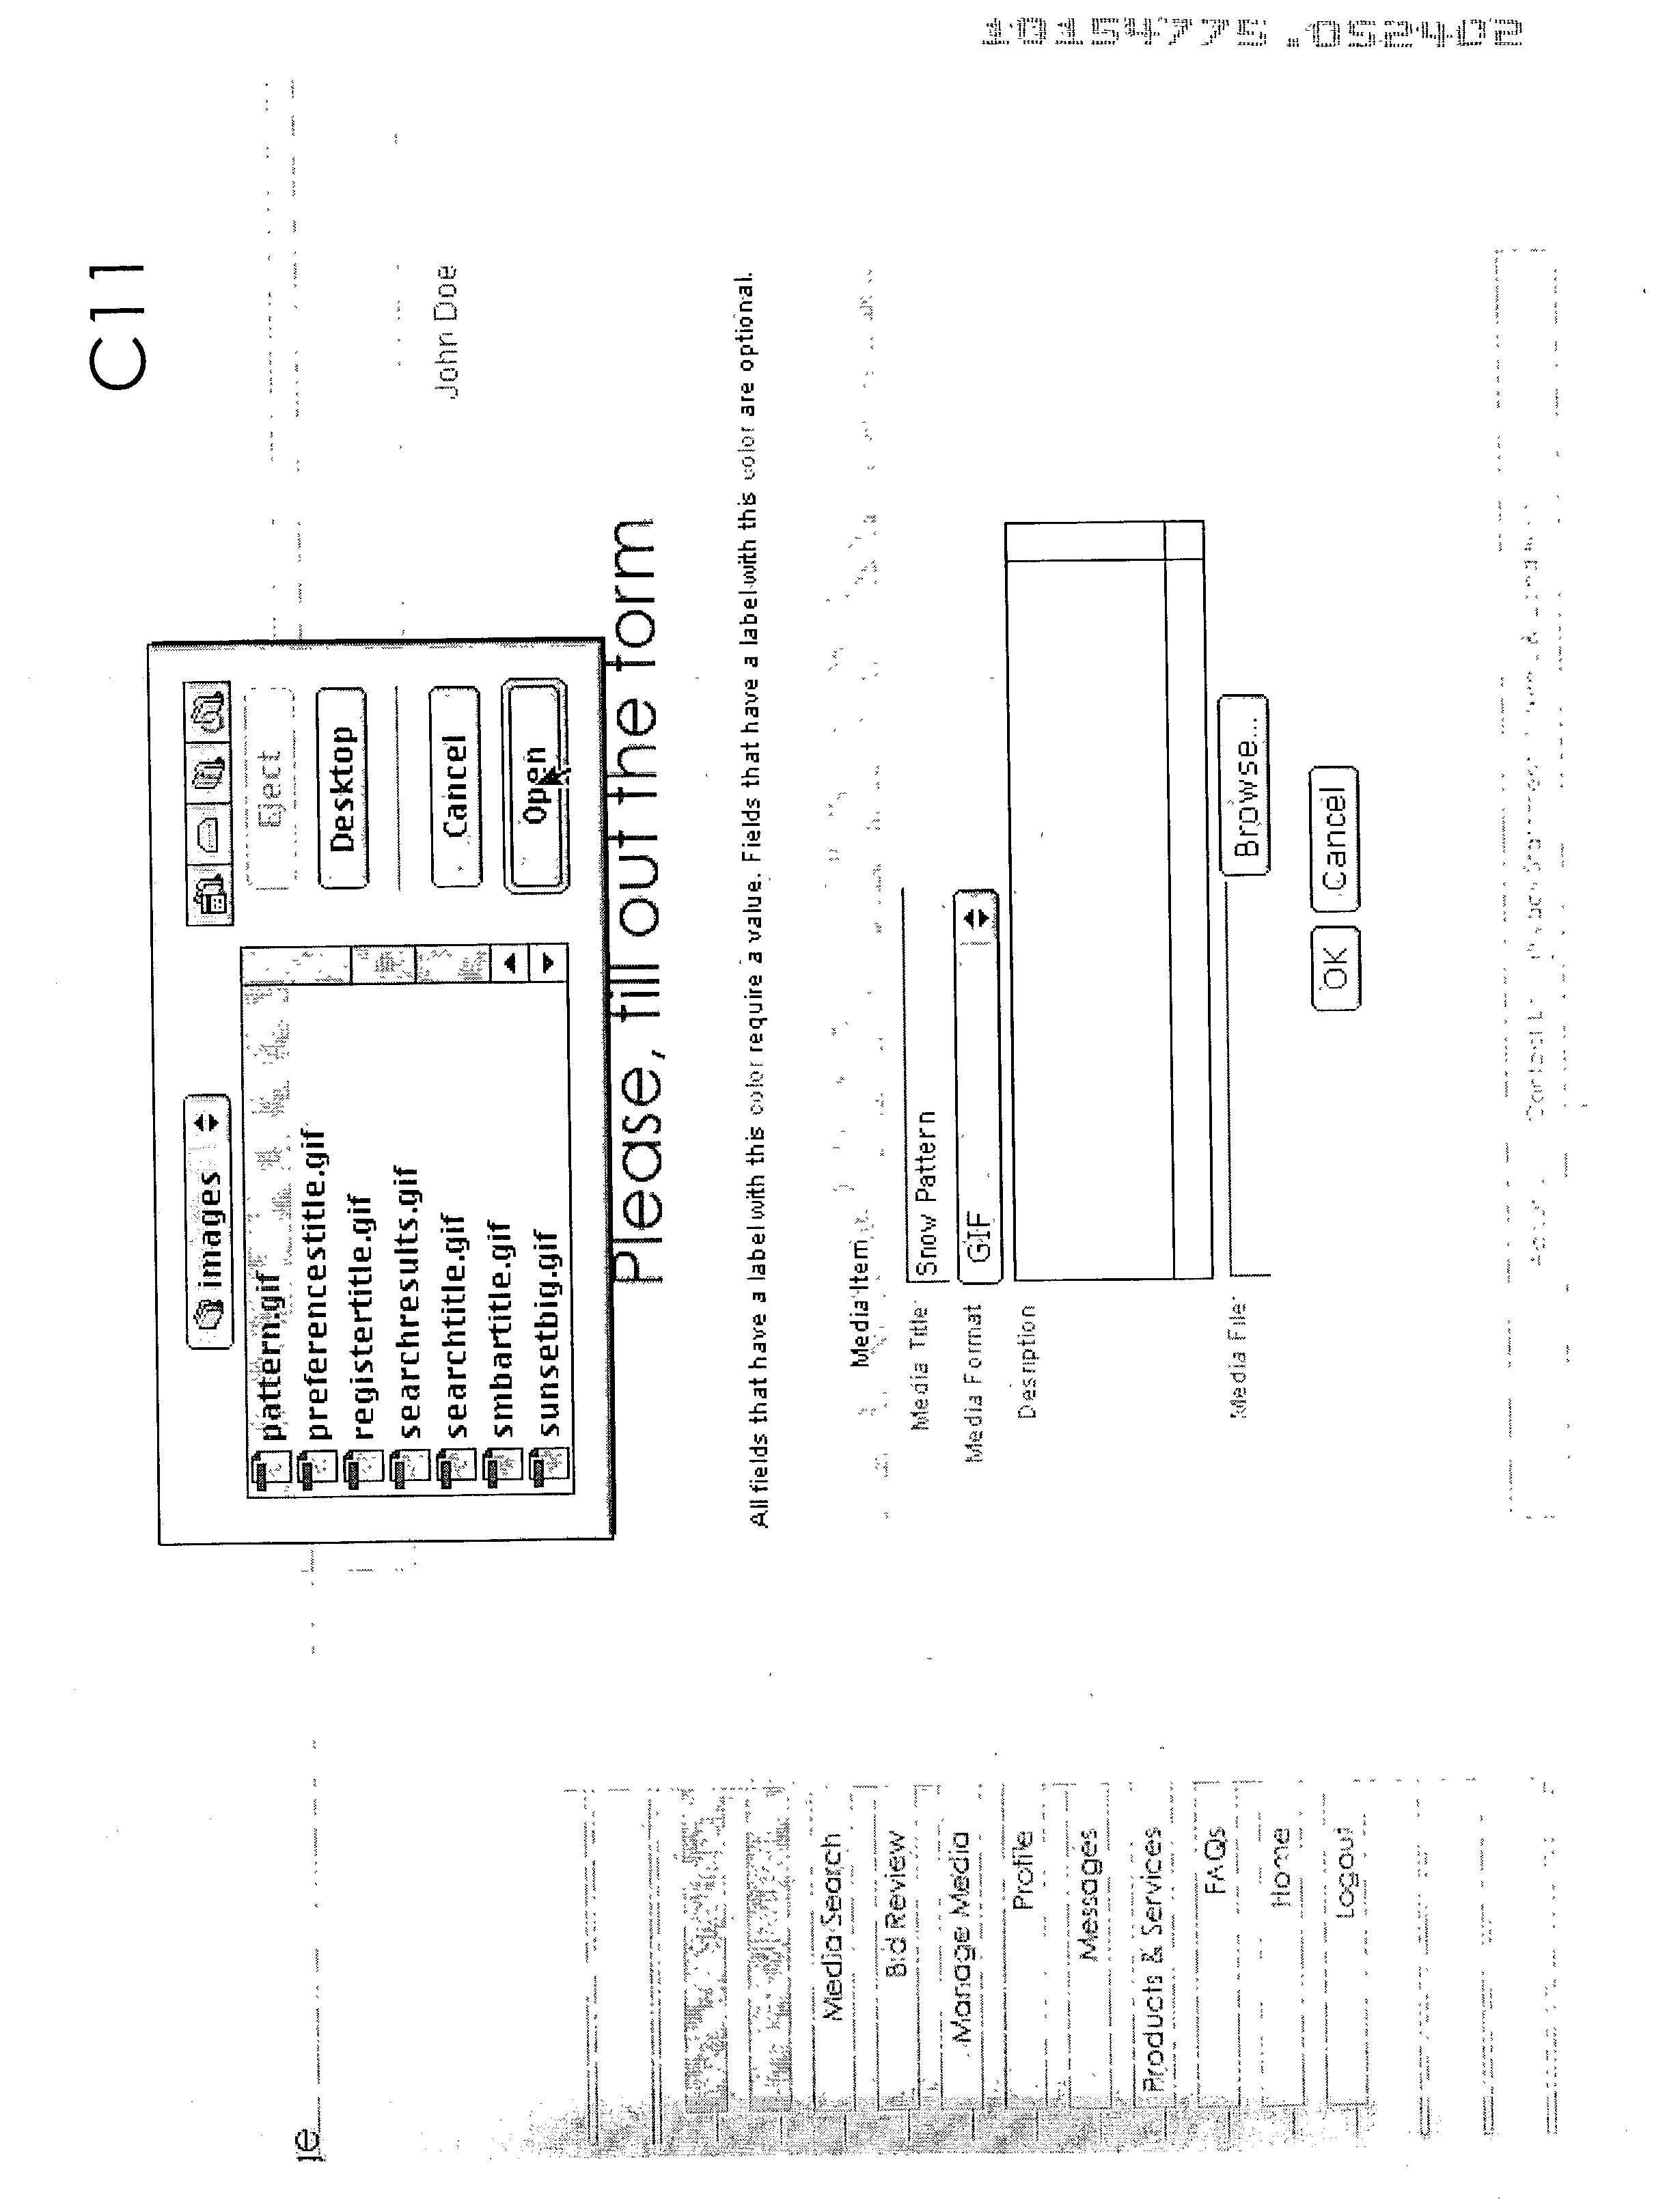 Figure US20030005428A1-20030102-P00159